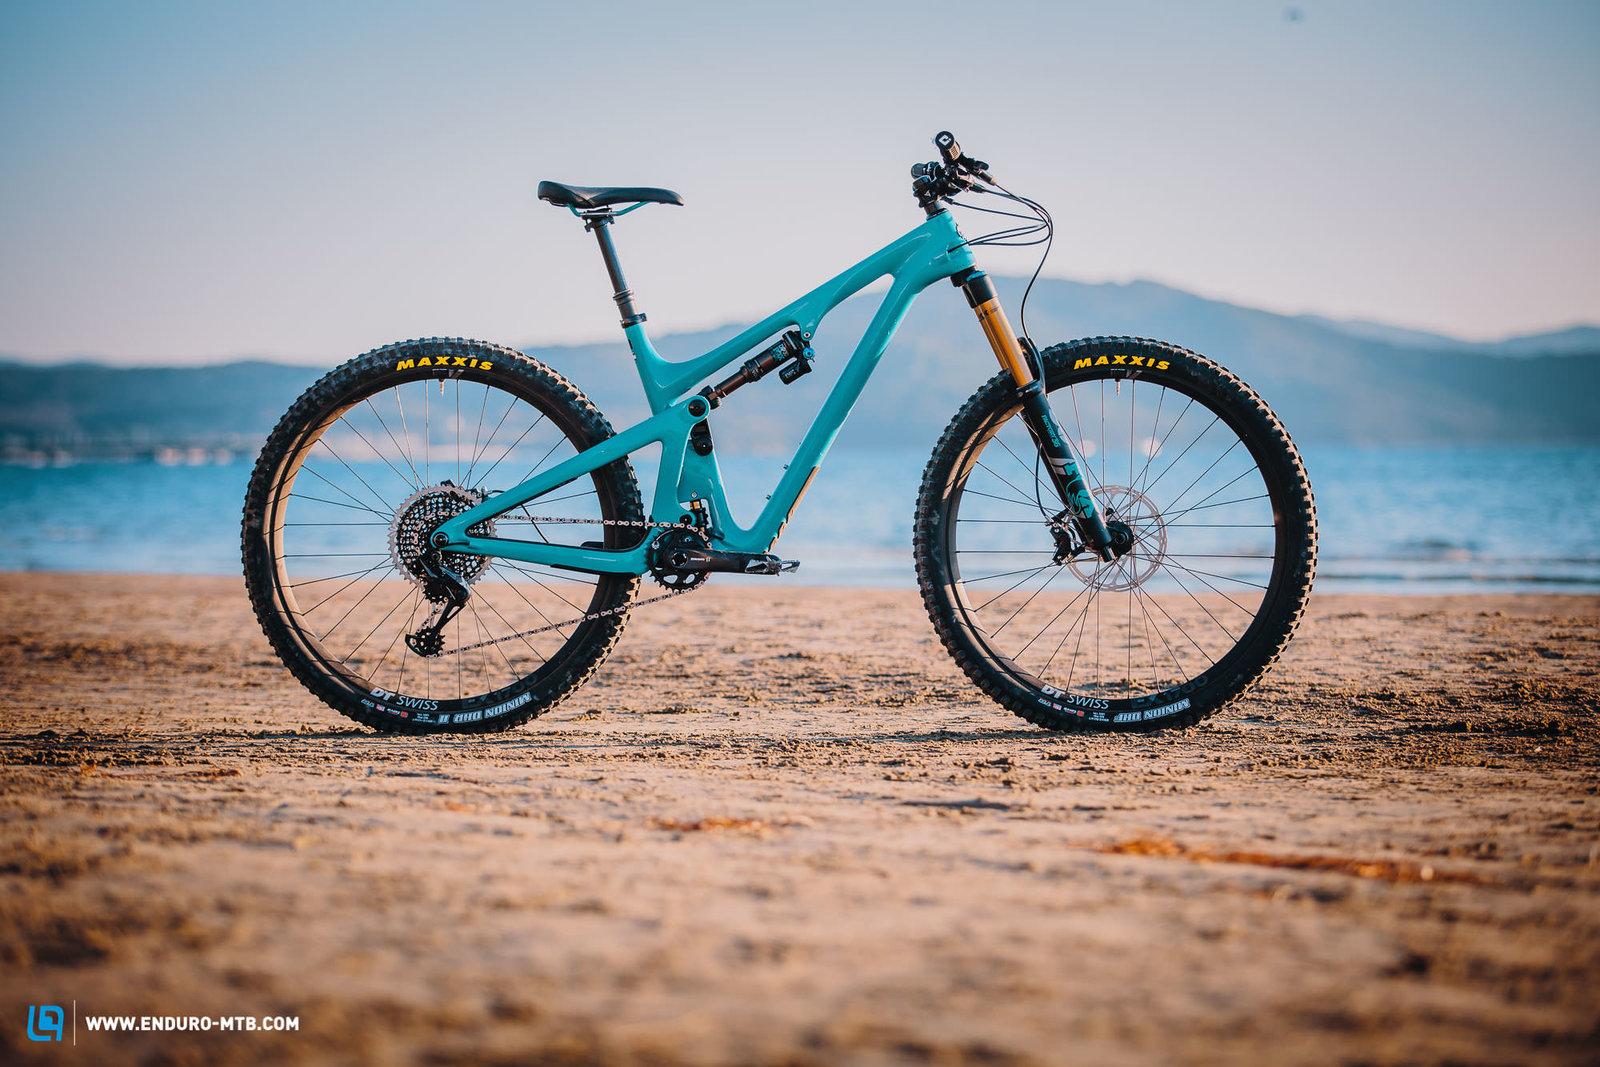 Yeti-SB130-TLR-Review-Test-Trail-Bike-Enduro-LR1747.jpg